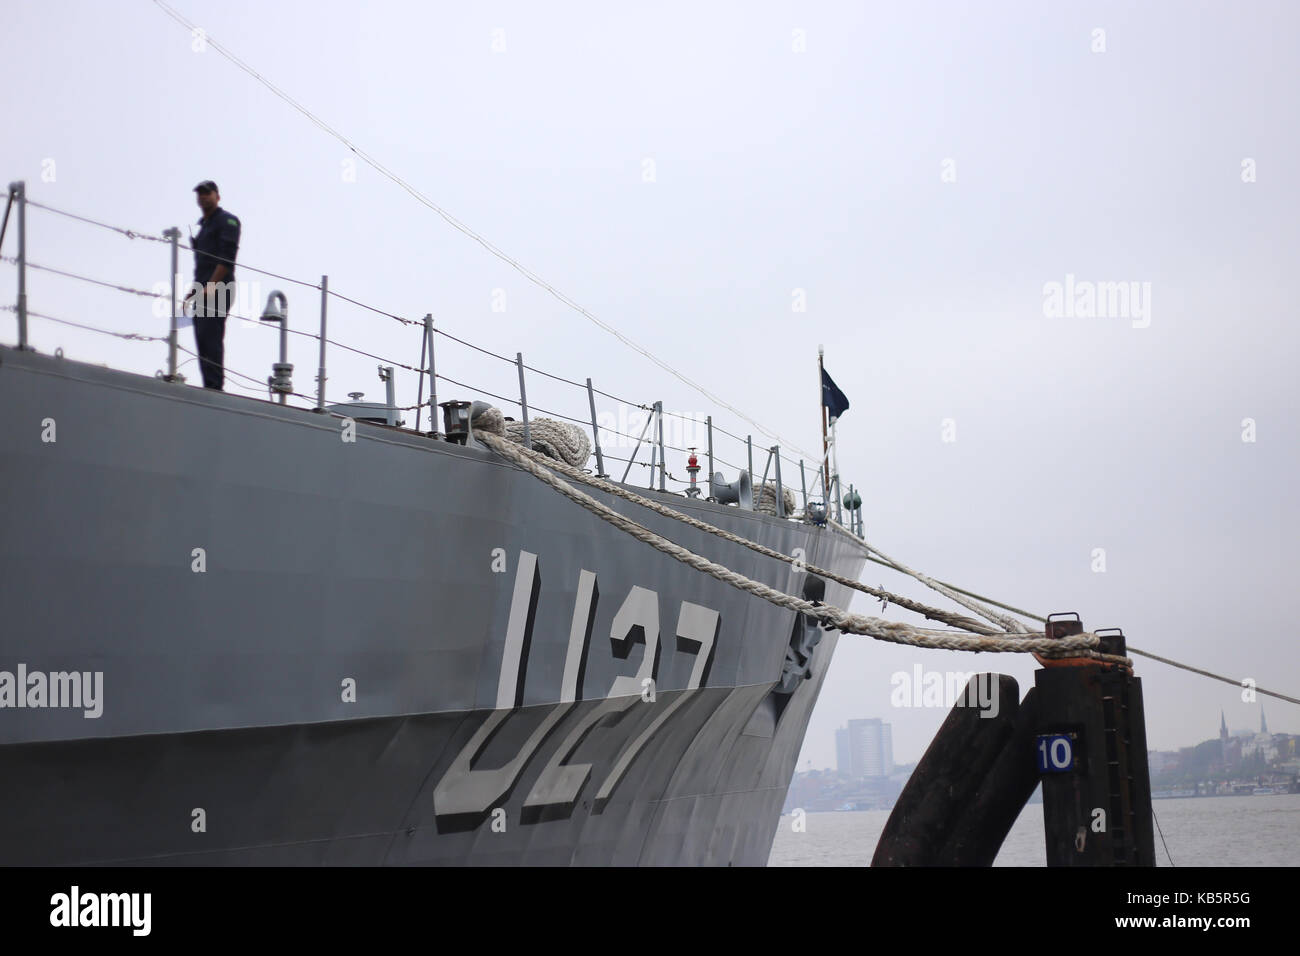 Brazilian training vvessel 'Navio Escola Brasil' anchors at a pier in Hamburg harbour, Germany, 28 September 2017. Stock Photo